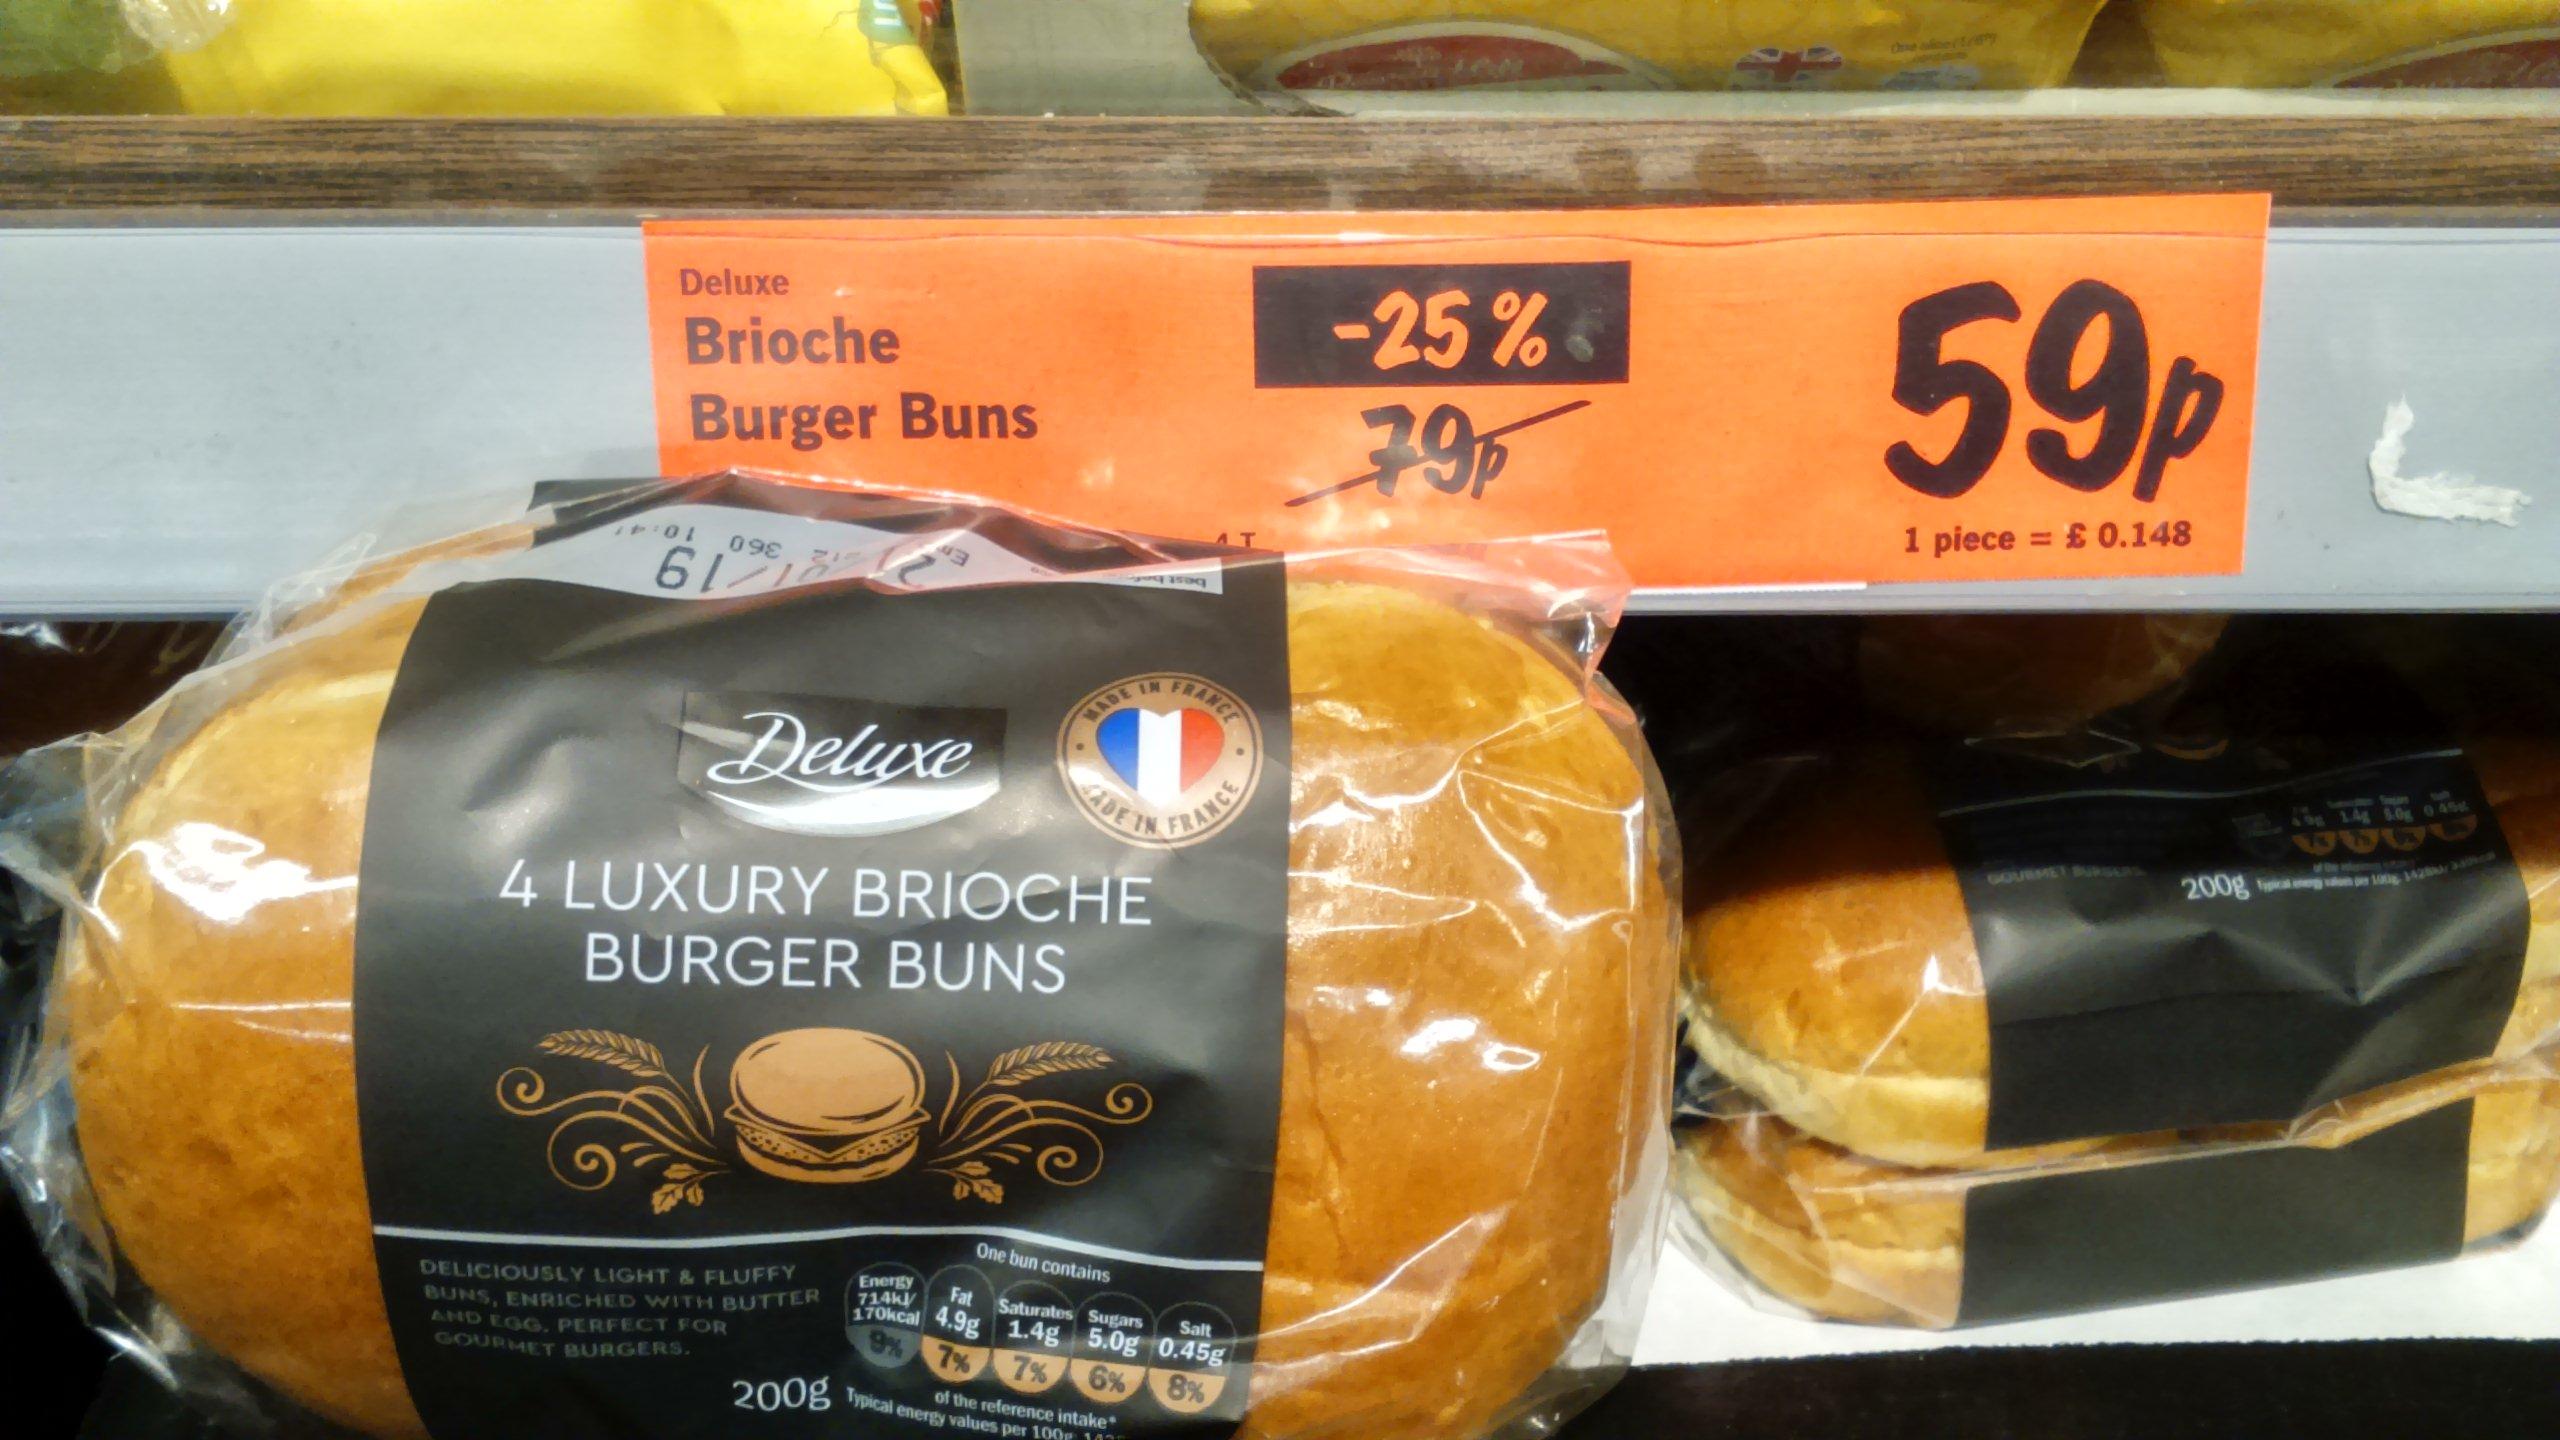 Lidl Deluxe Luxury Brioche Burger Buns 4 pack 59p @ LIDL